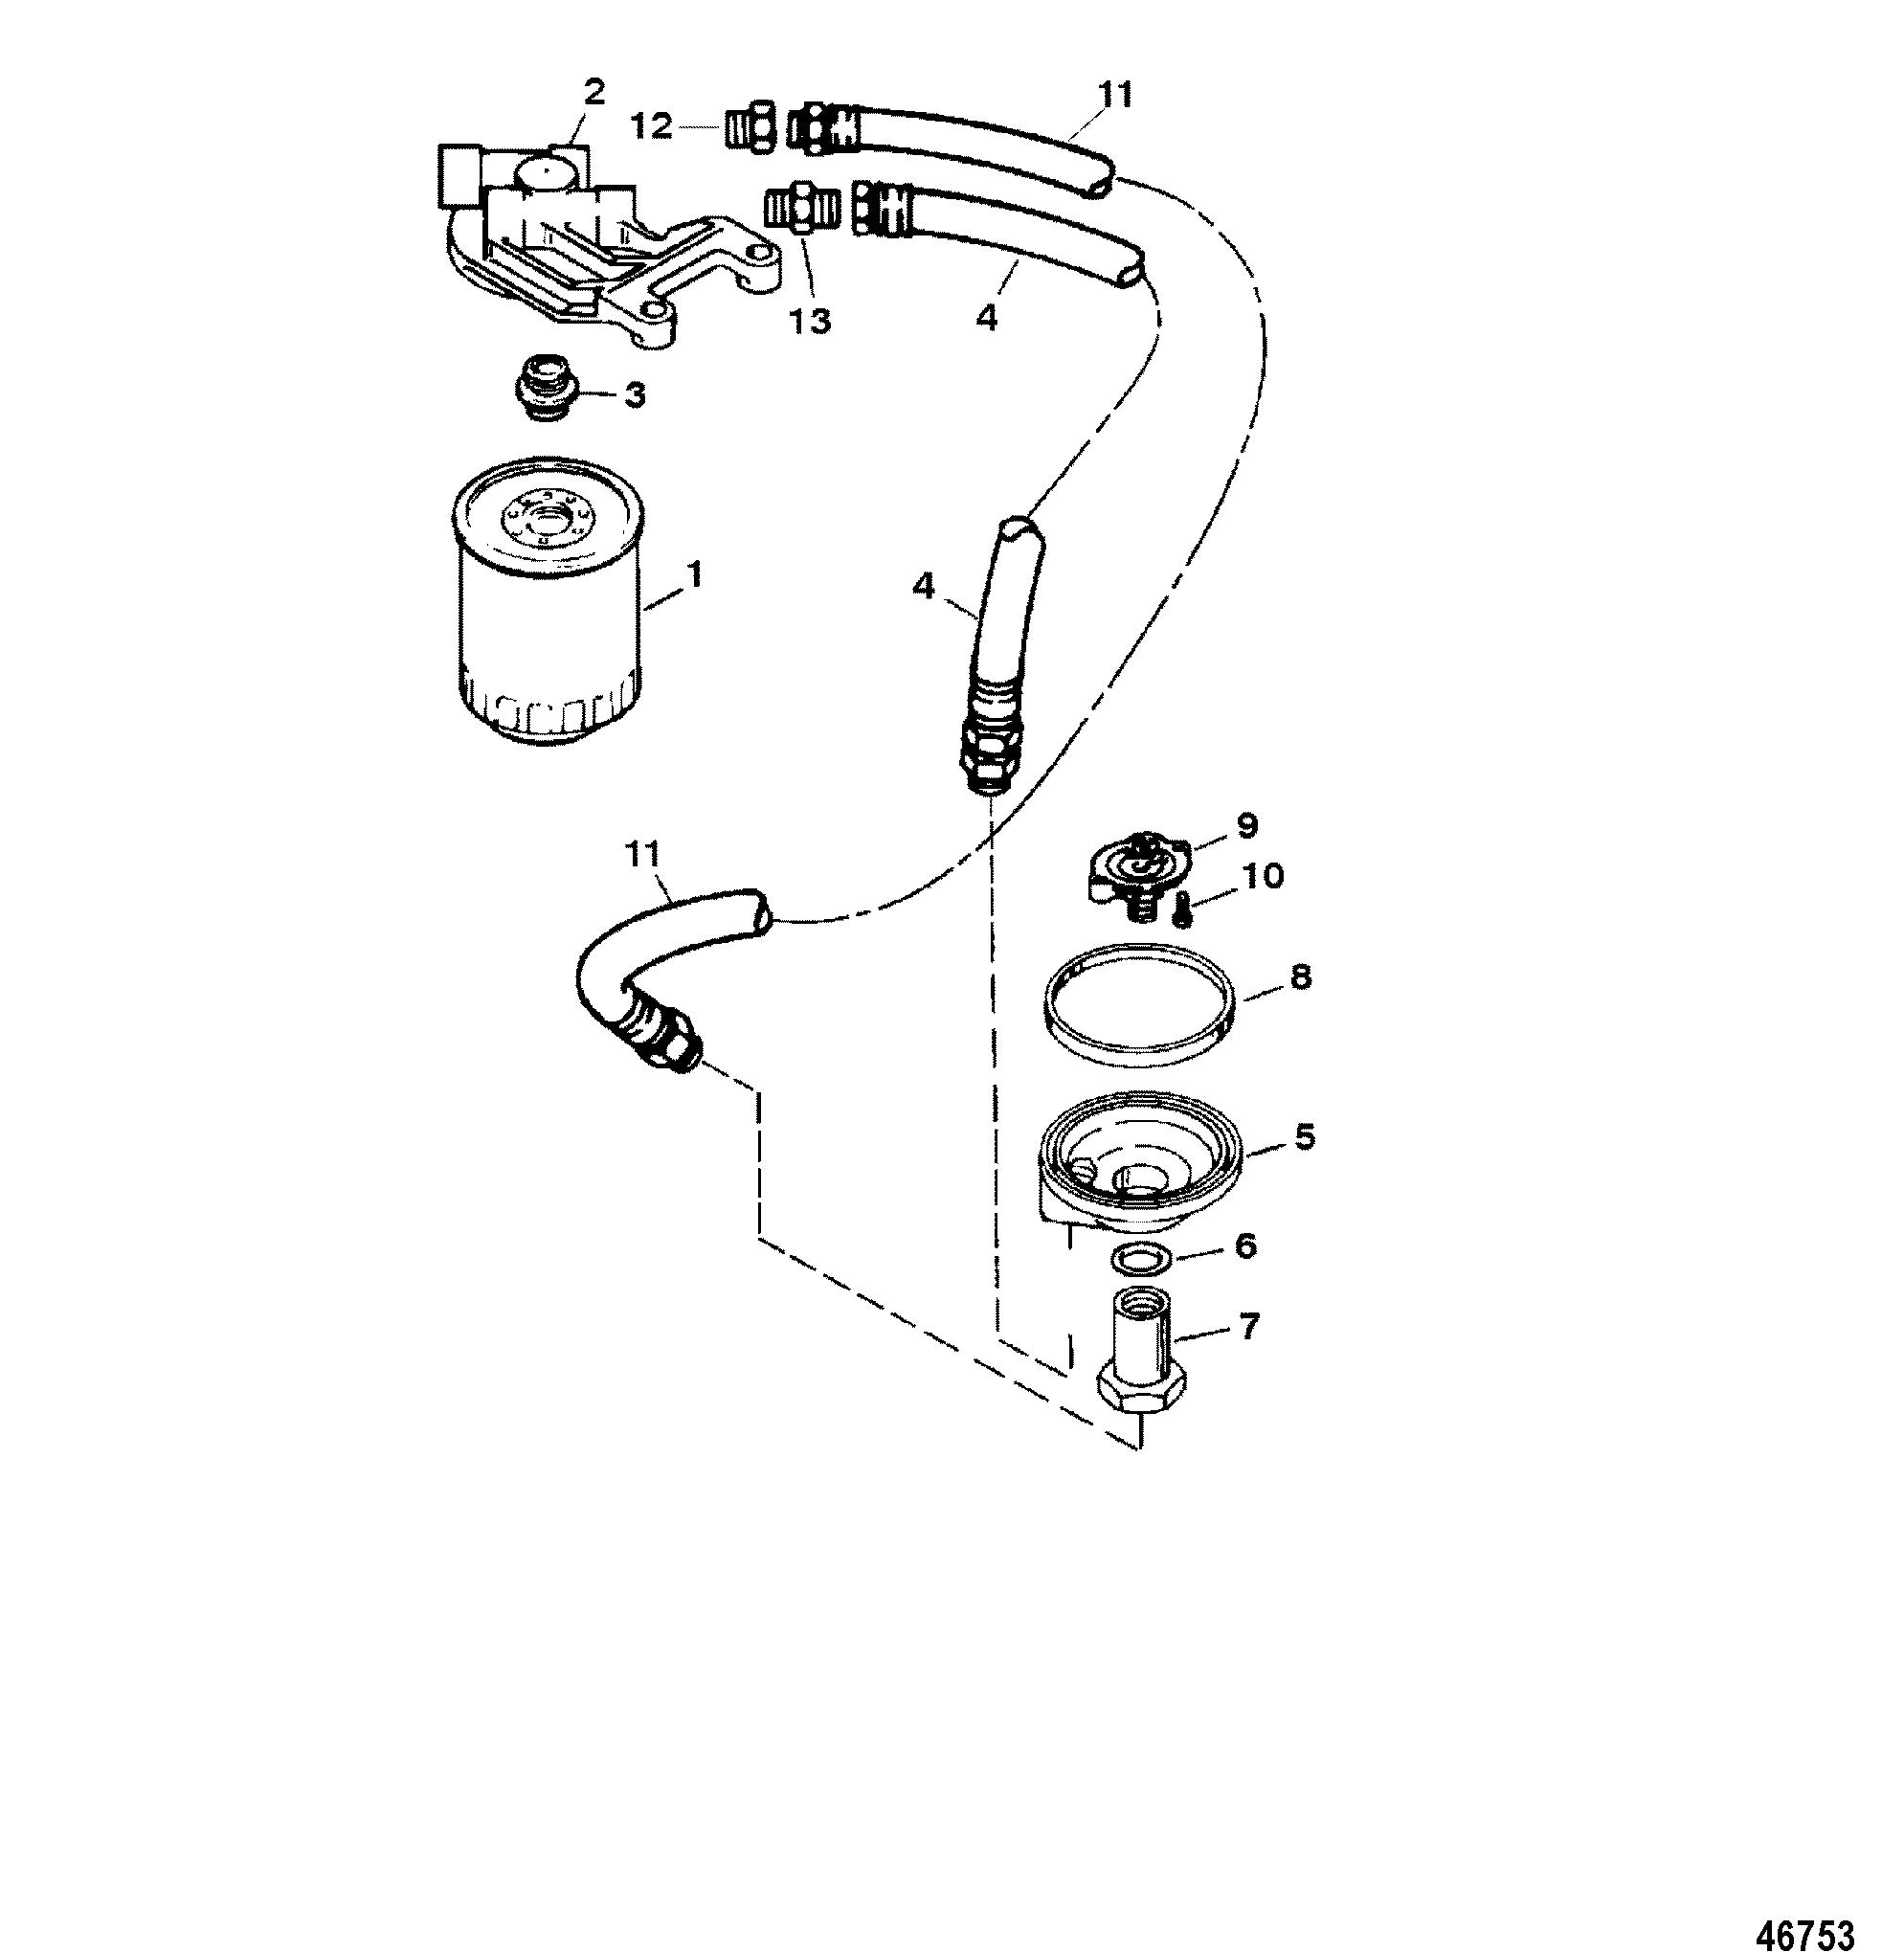 oil filter and adaptor for mercruiser 350 magnum alpha efi